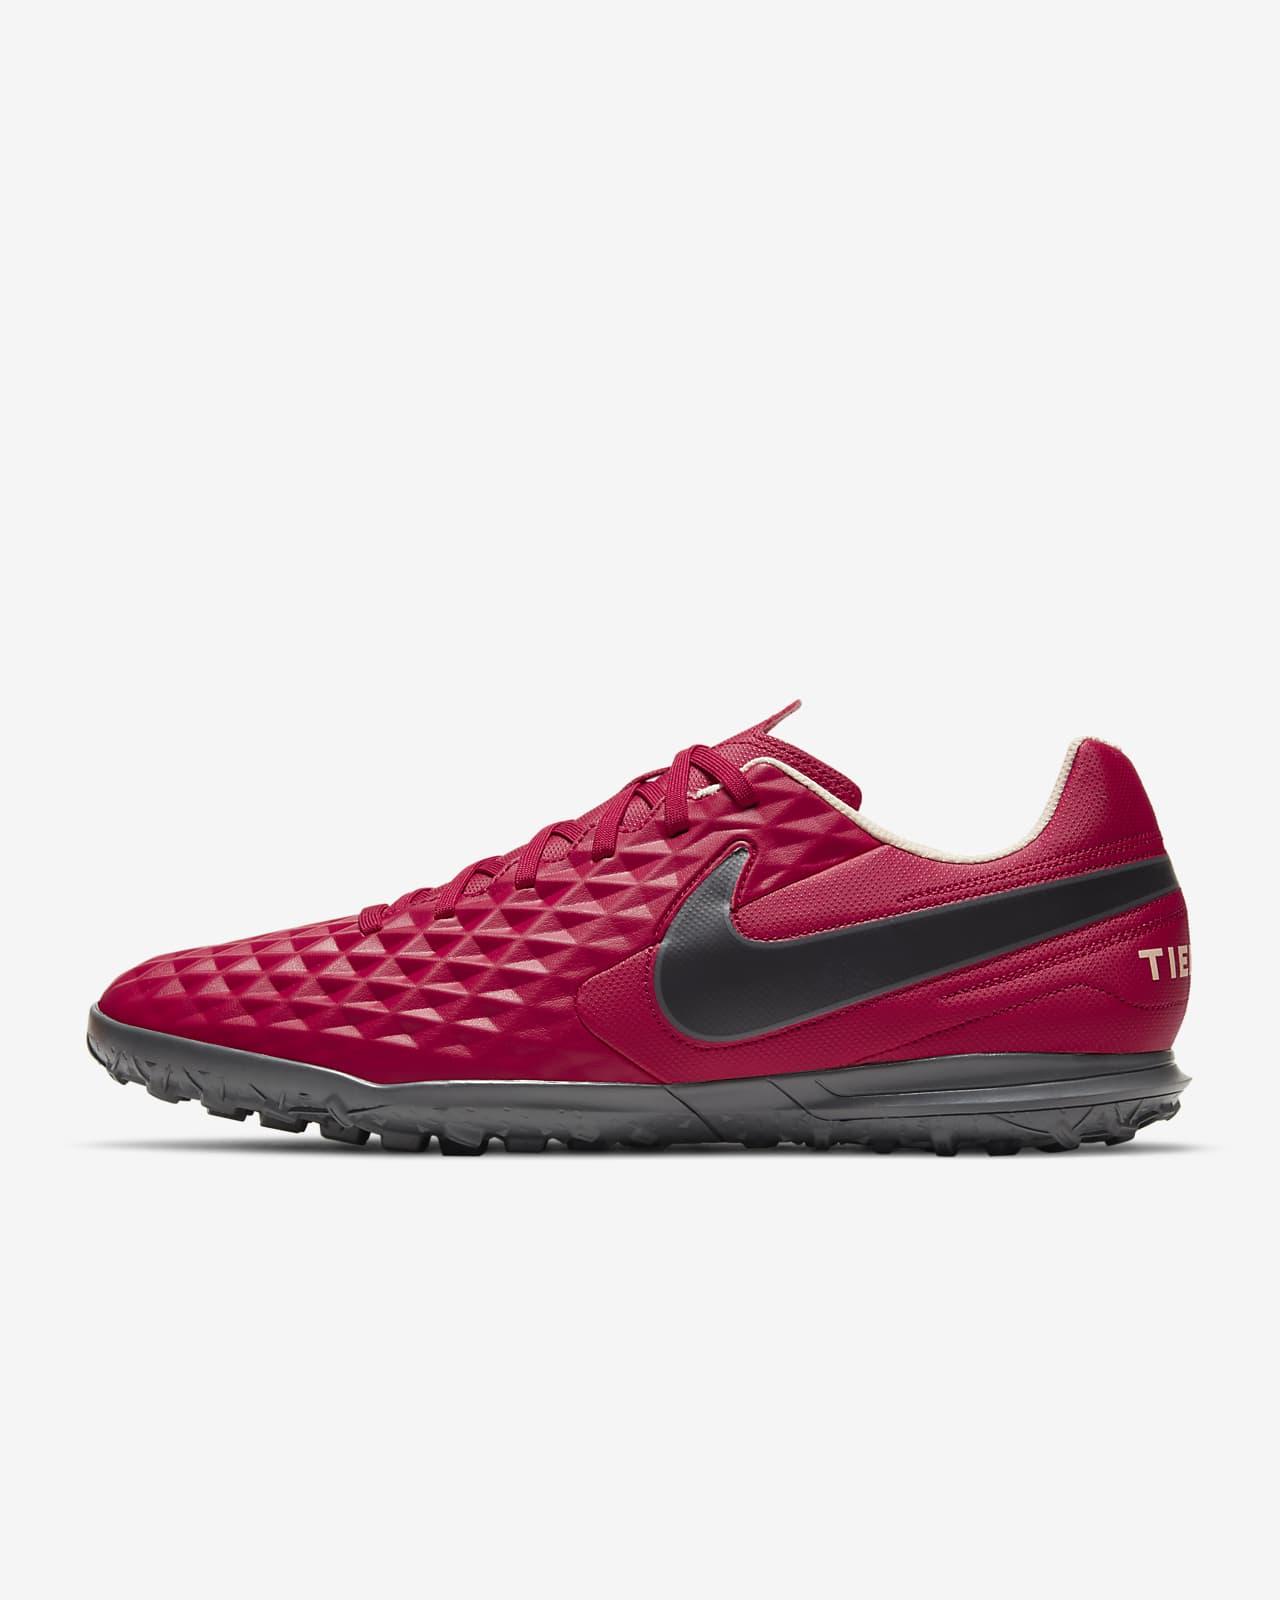 Chaussure de football pour surface synthétique Nike Tiempo Legend 8 Club TF